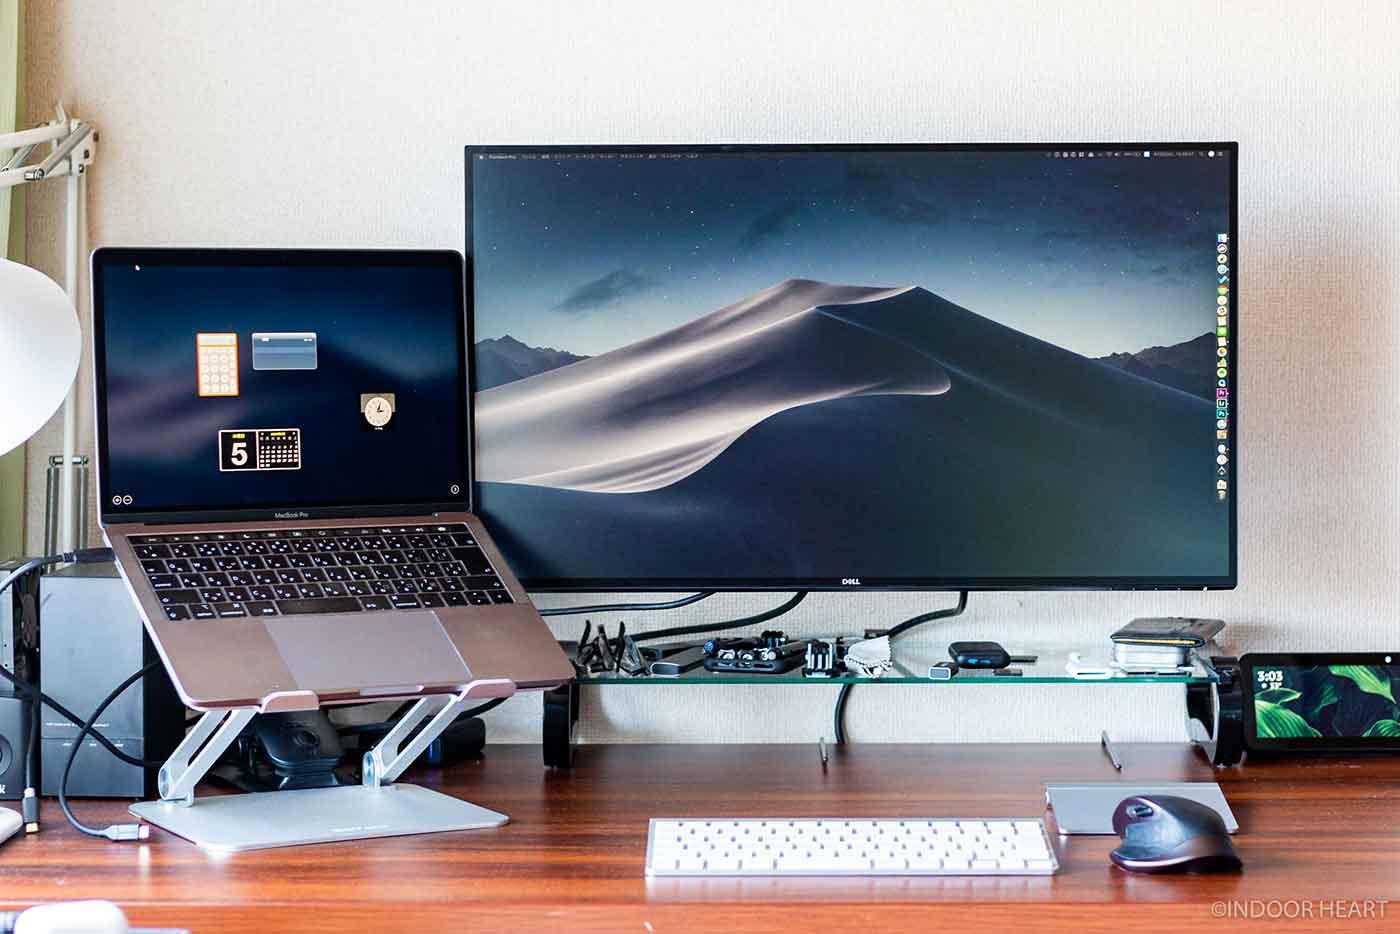 MacBookと4Kモニター